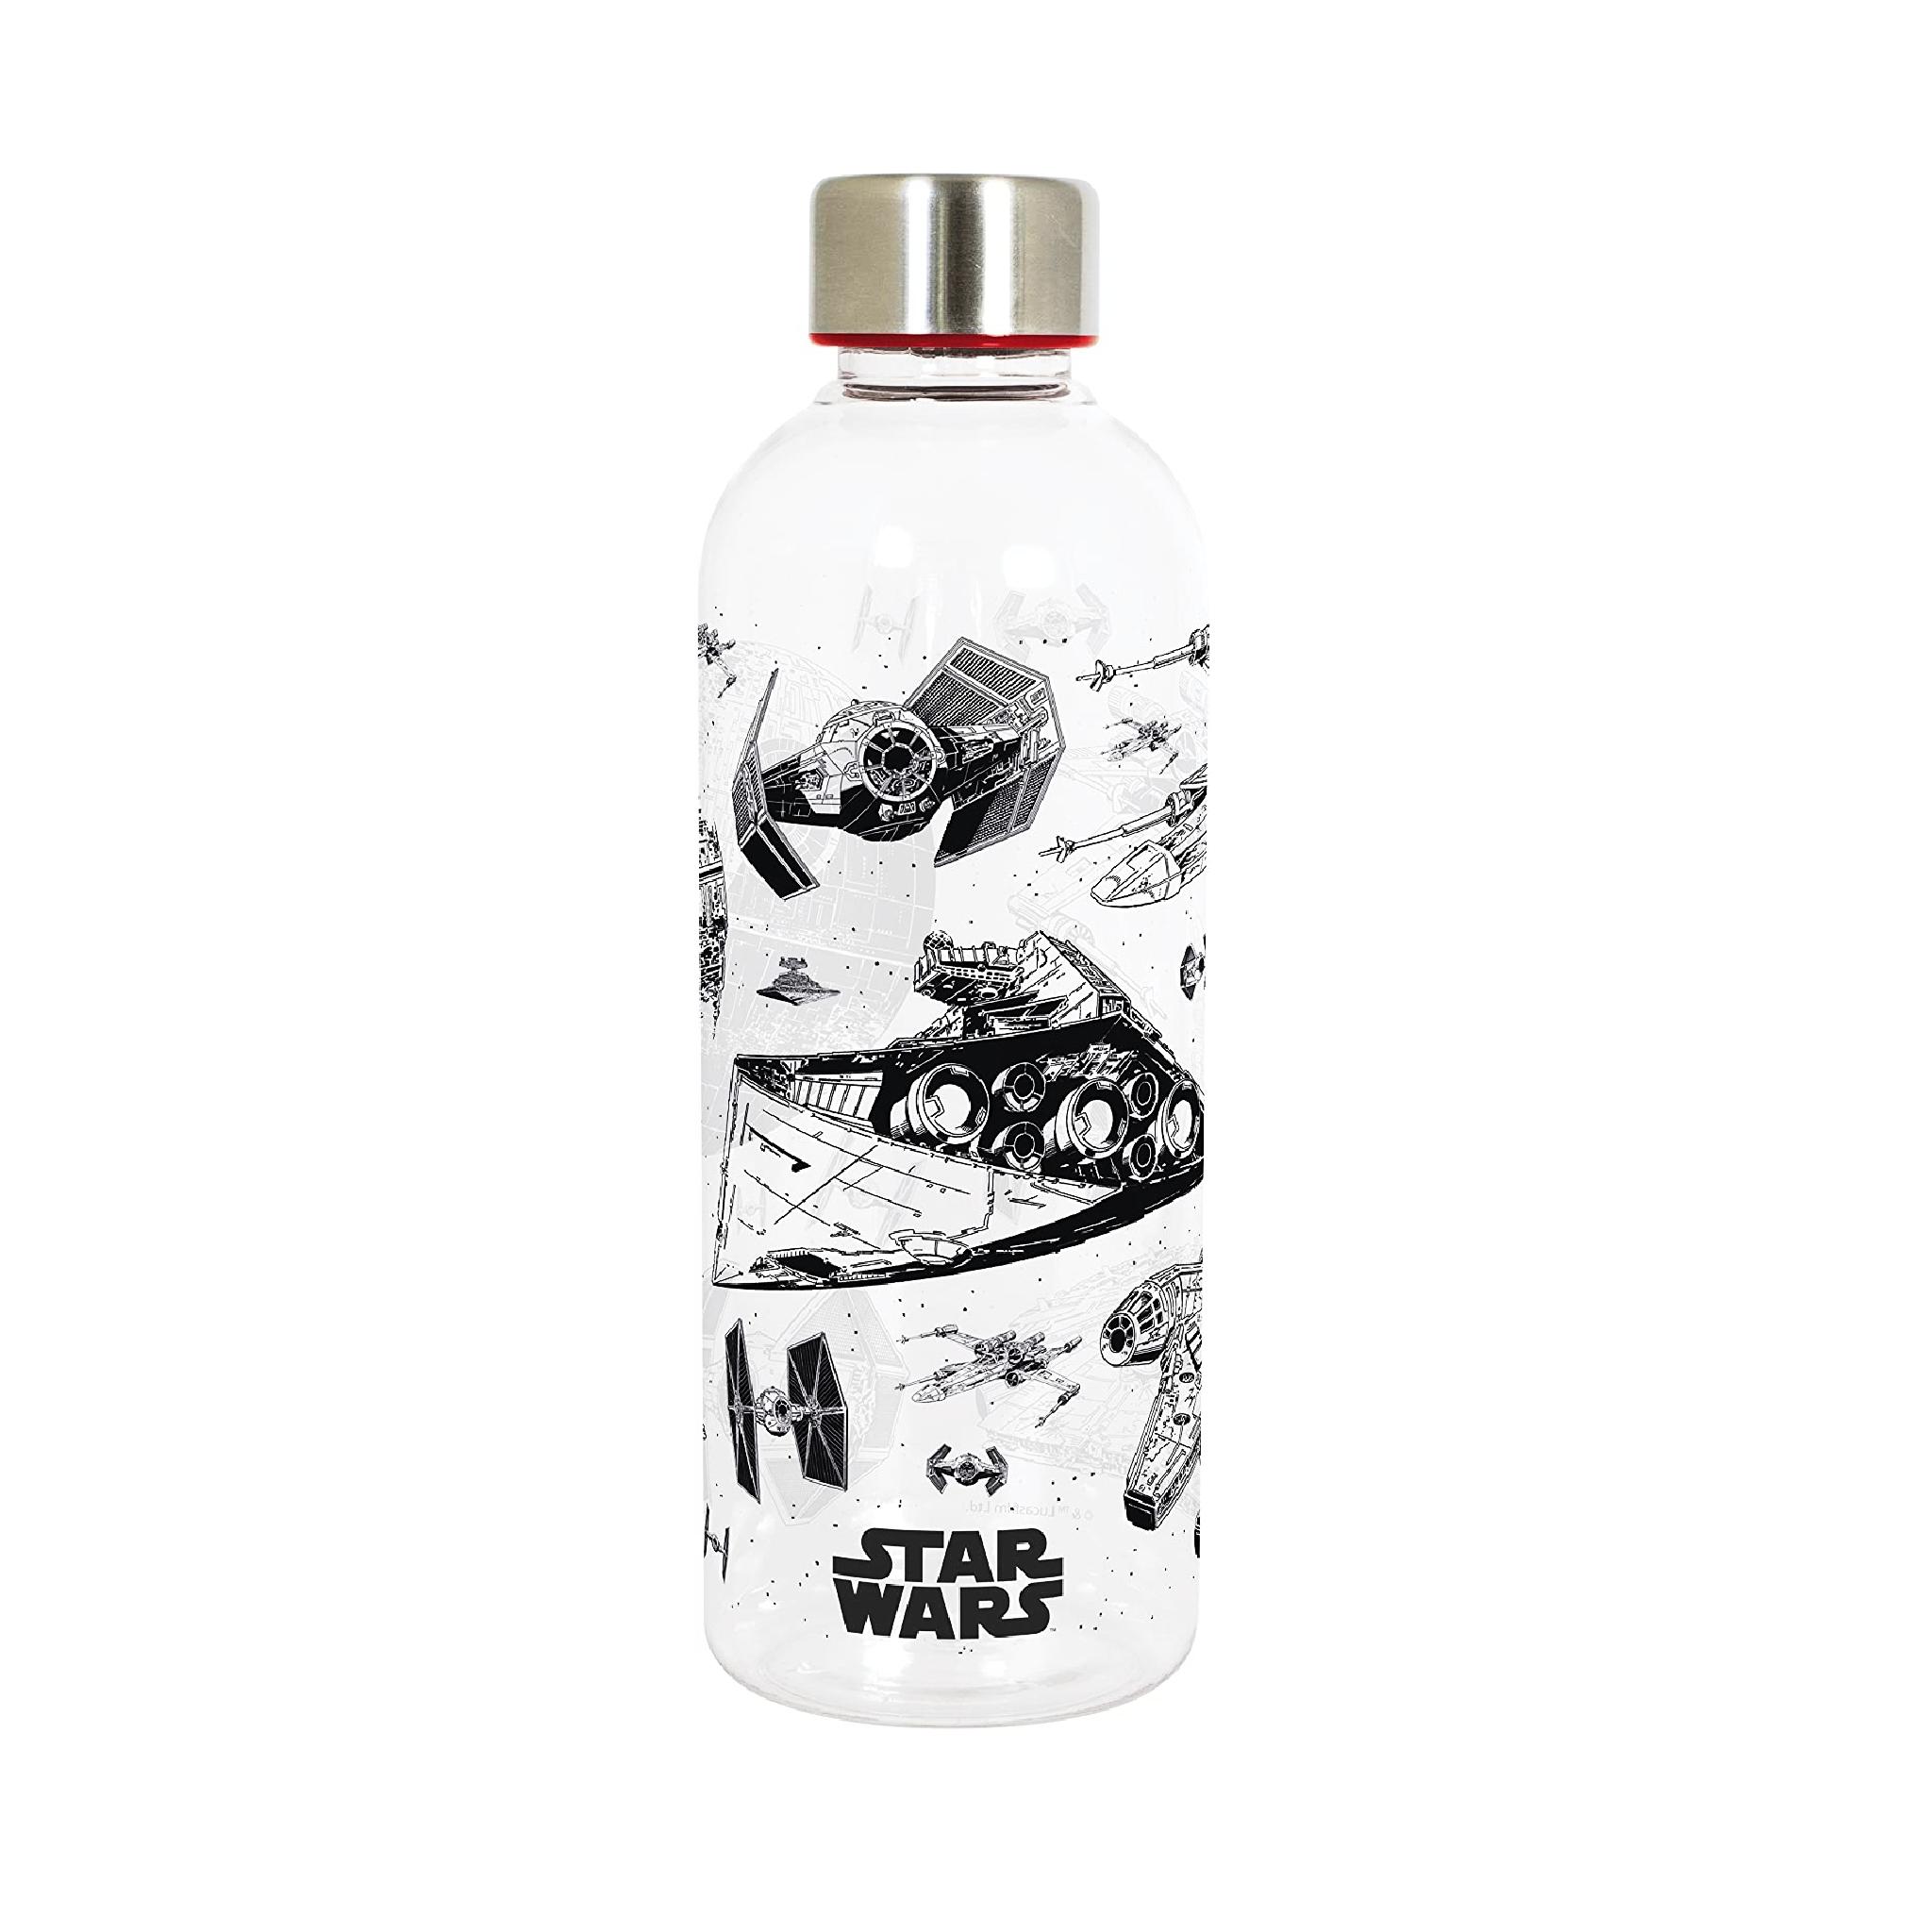 Star Wars bottle - a perfect gadget for every Star Wars fan